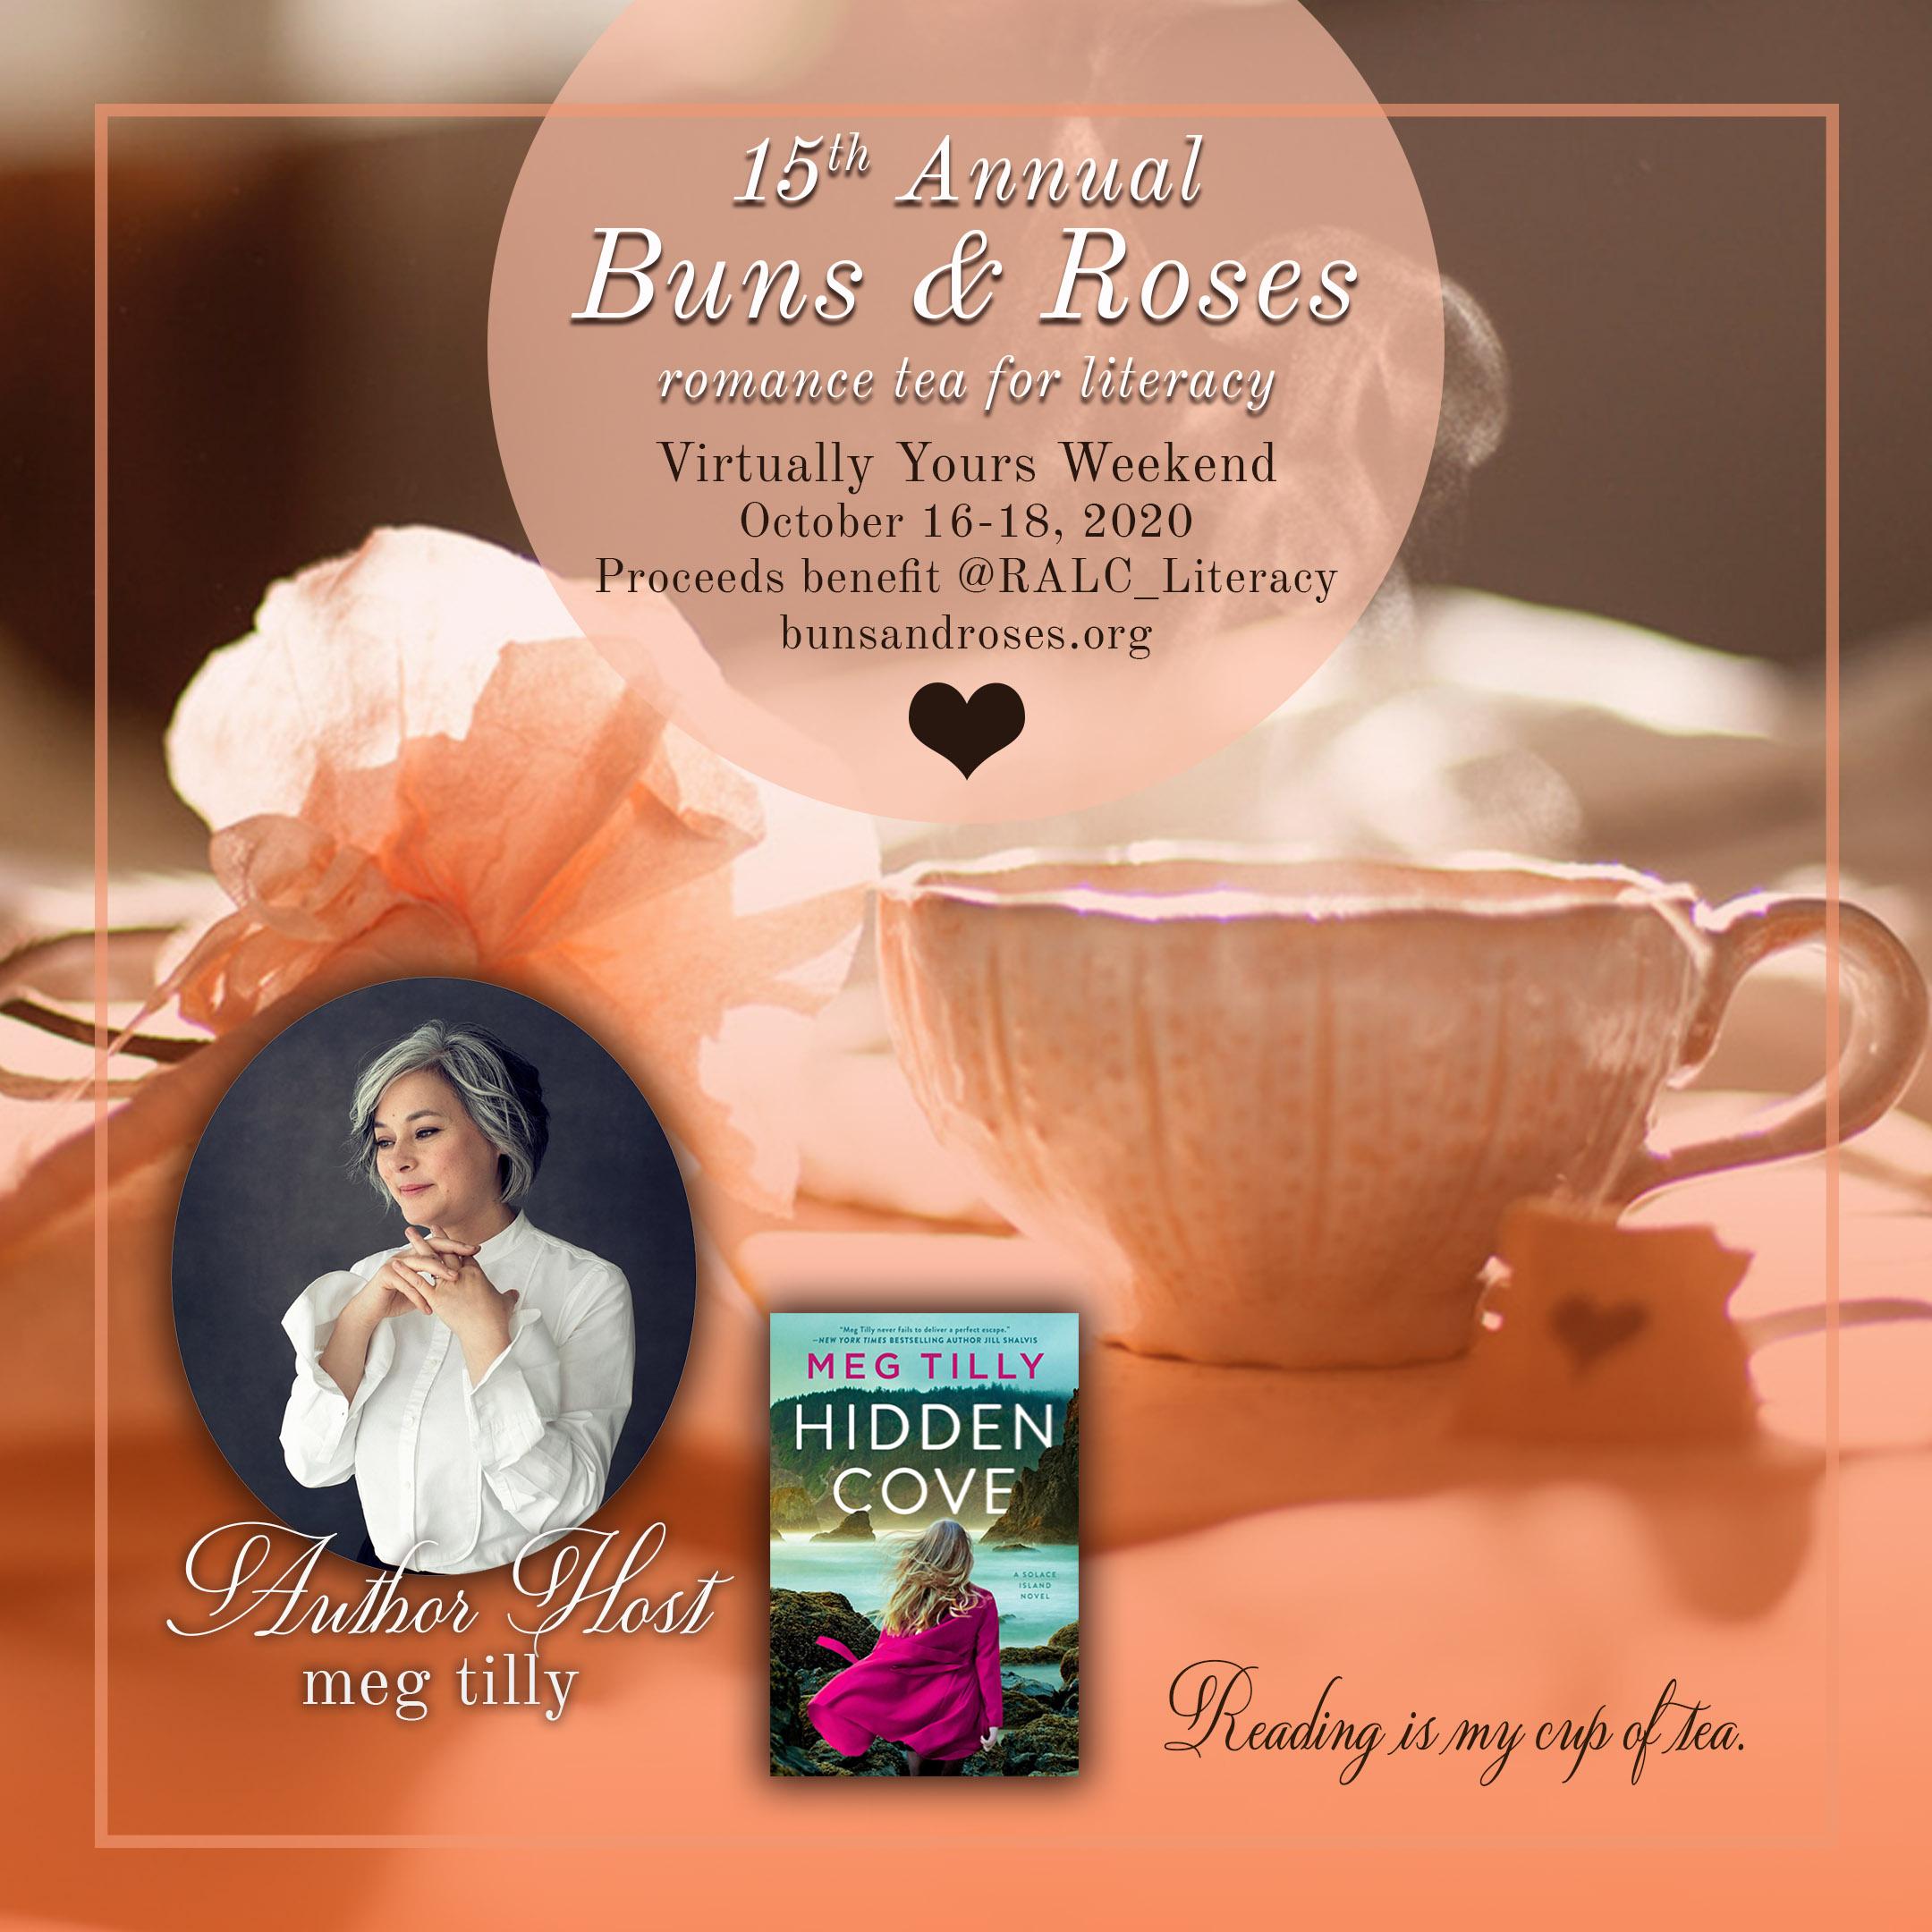 Buns & Roses Romance Tea for Literacy